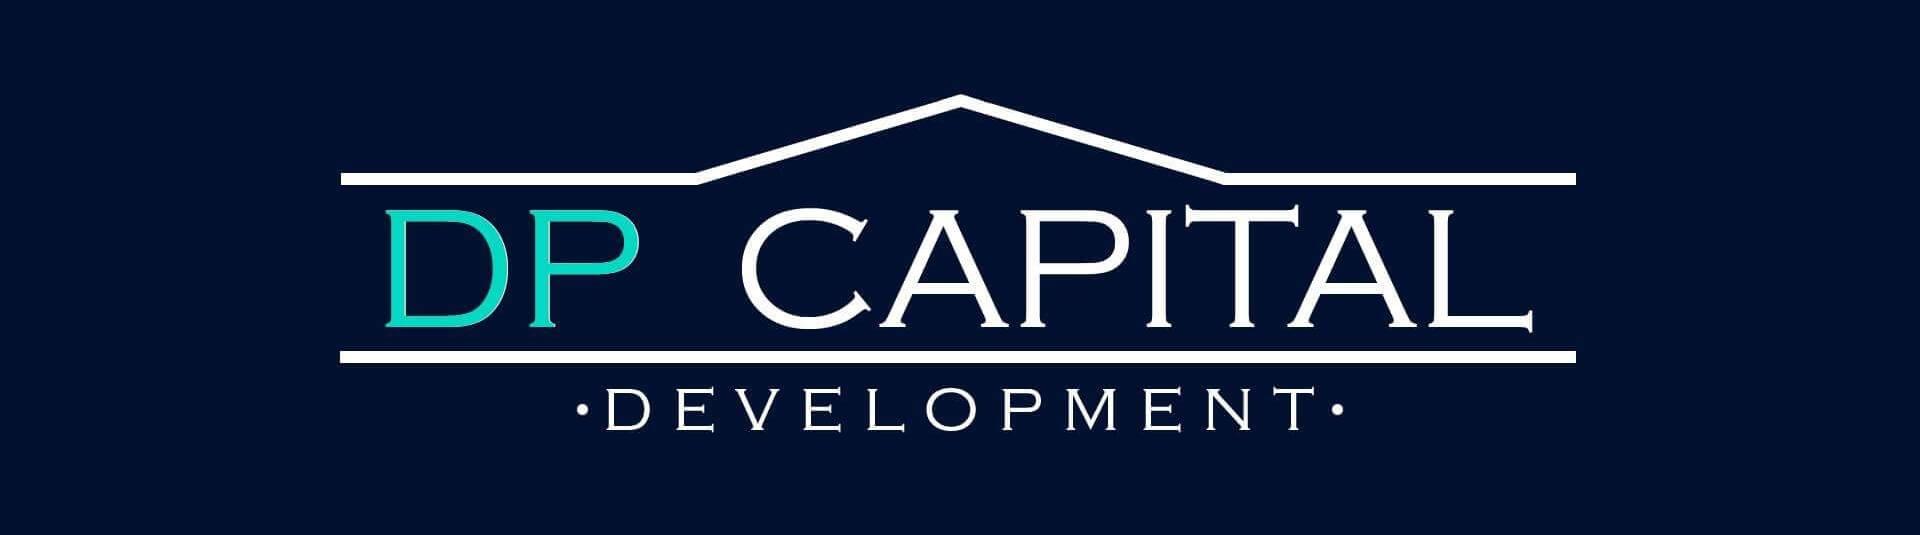 DP Capitaljpg